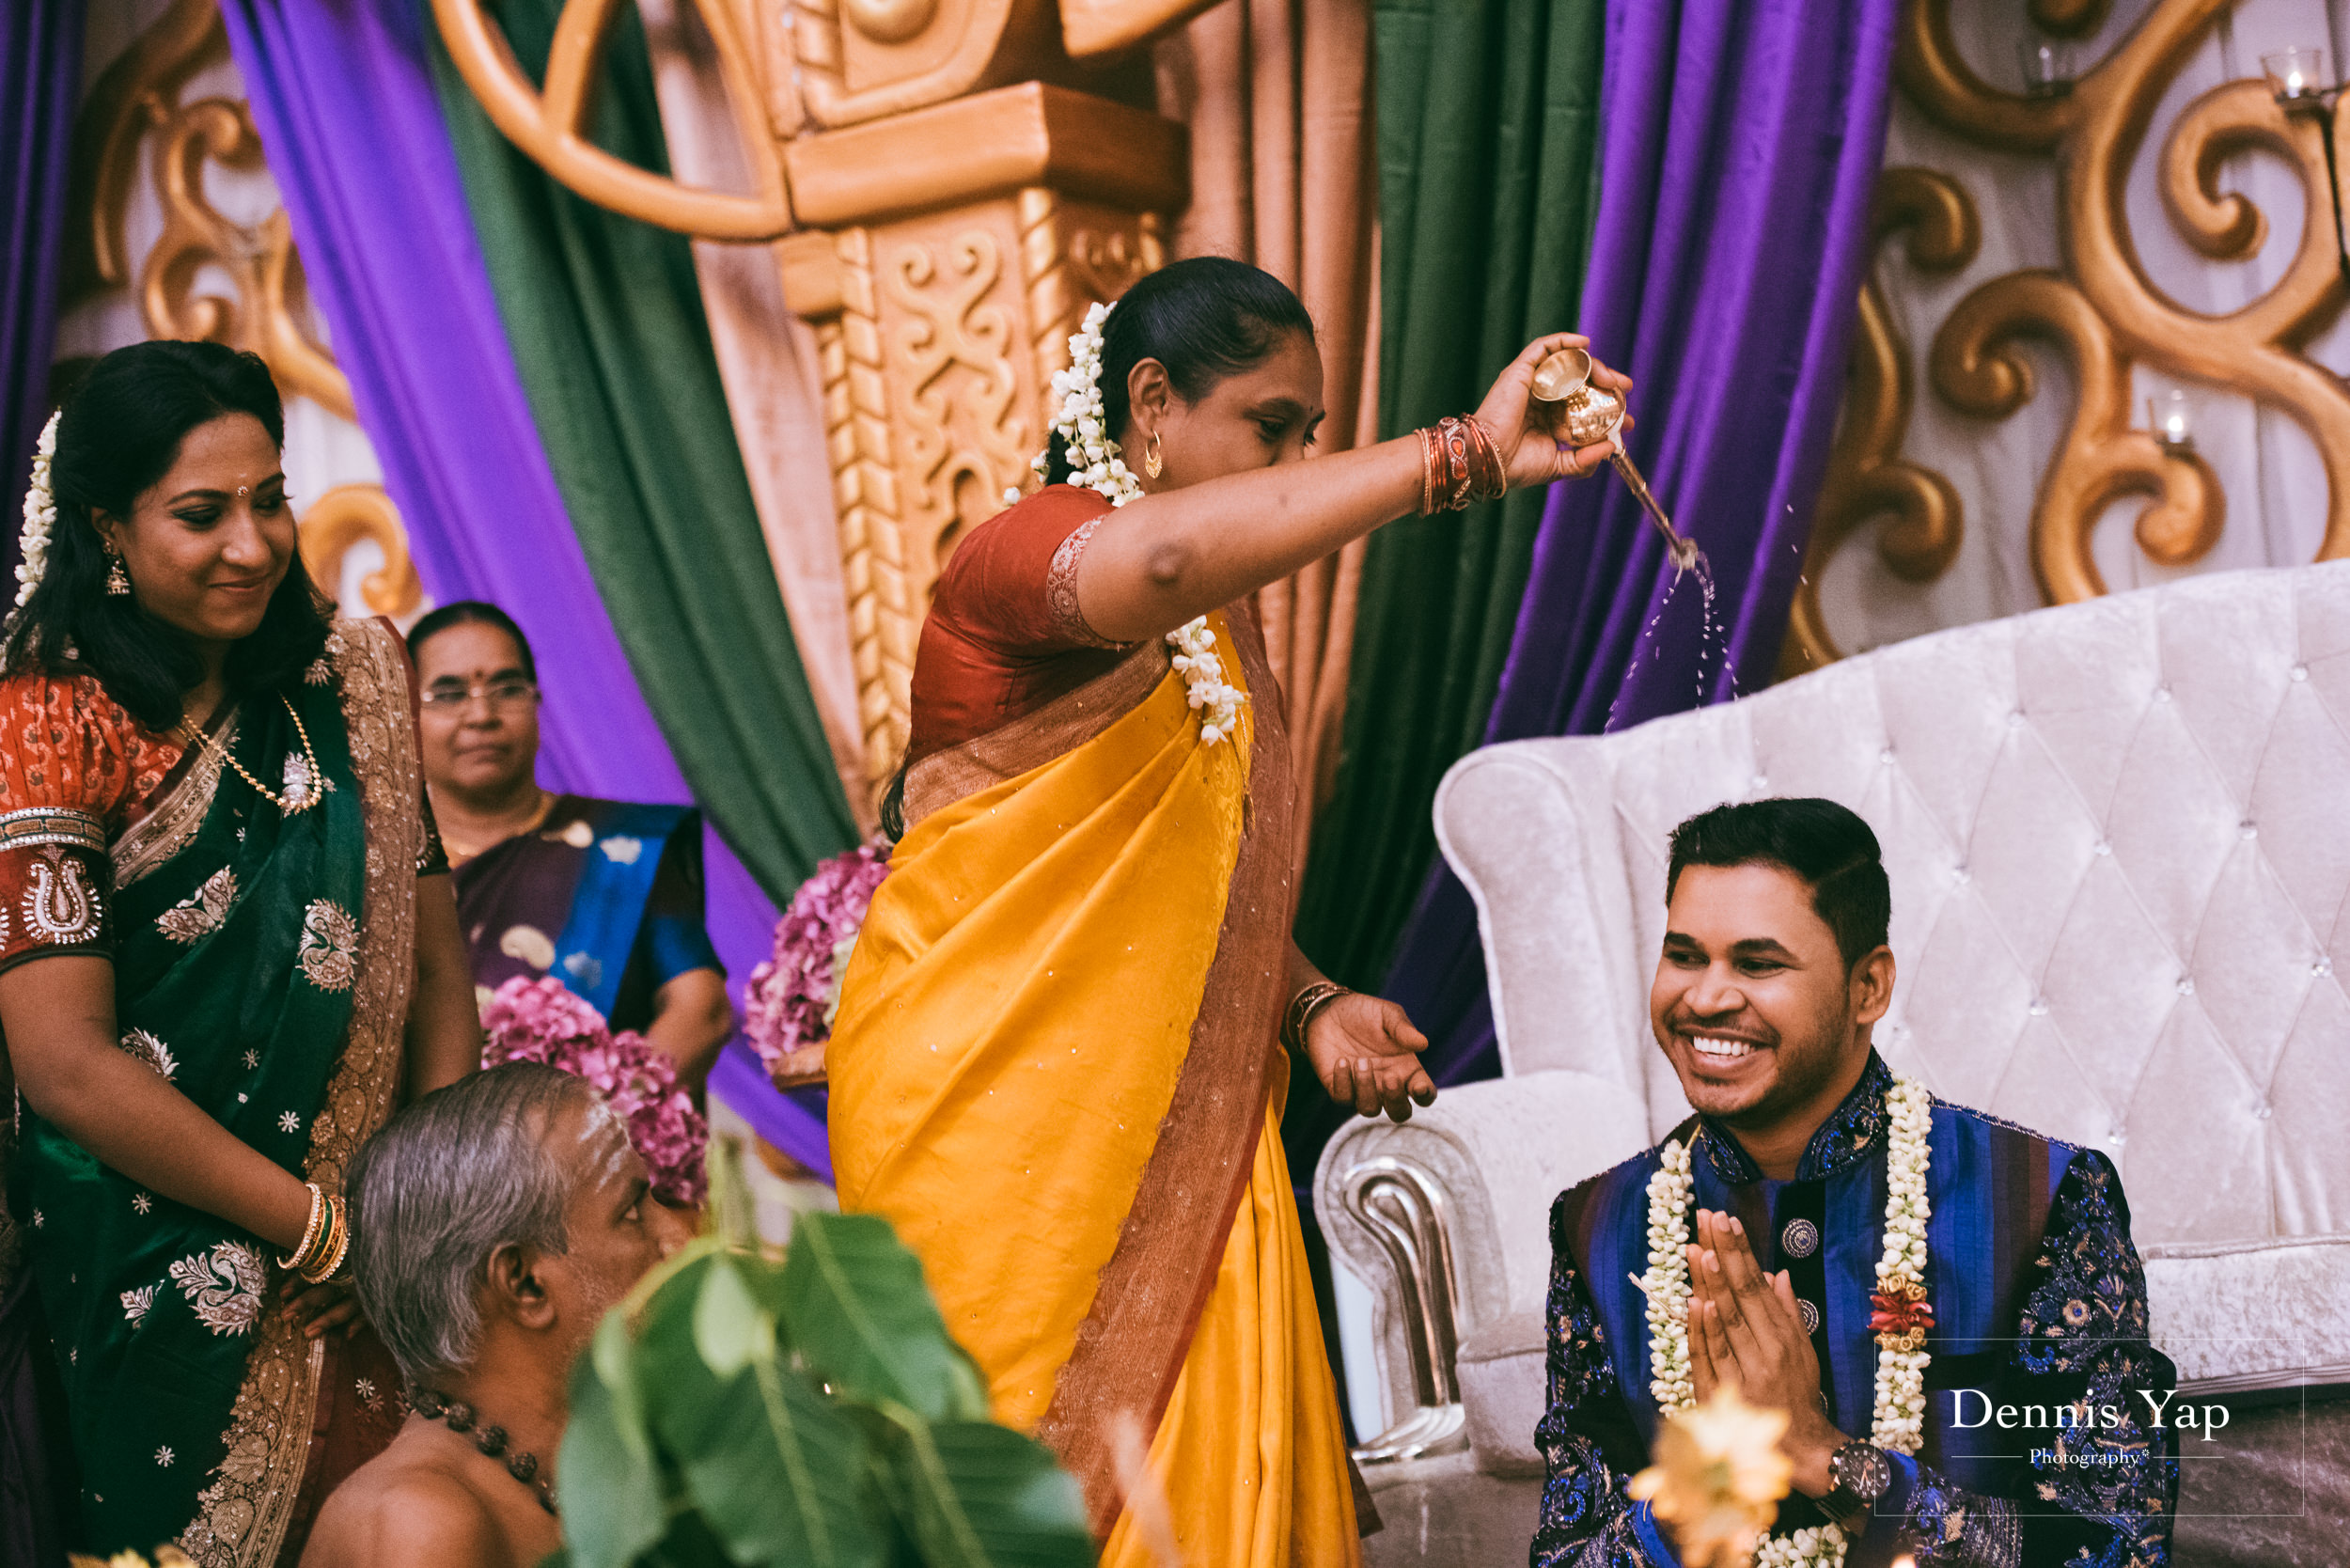 puvaneswaran cangitaa indian wedding ceremony ideal convention dennis yap photography malaysia-14.jpg